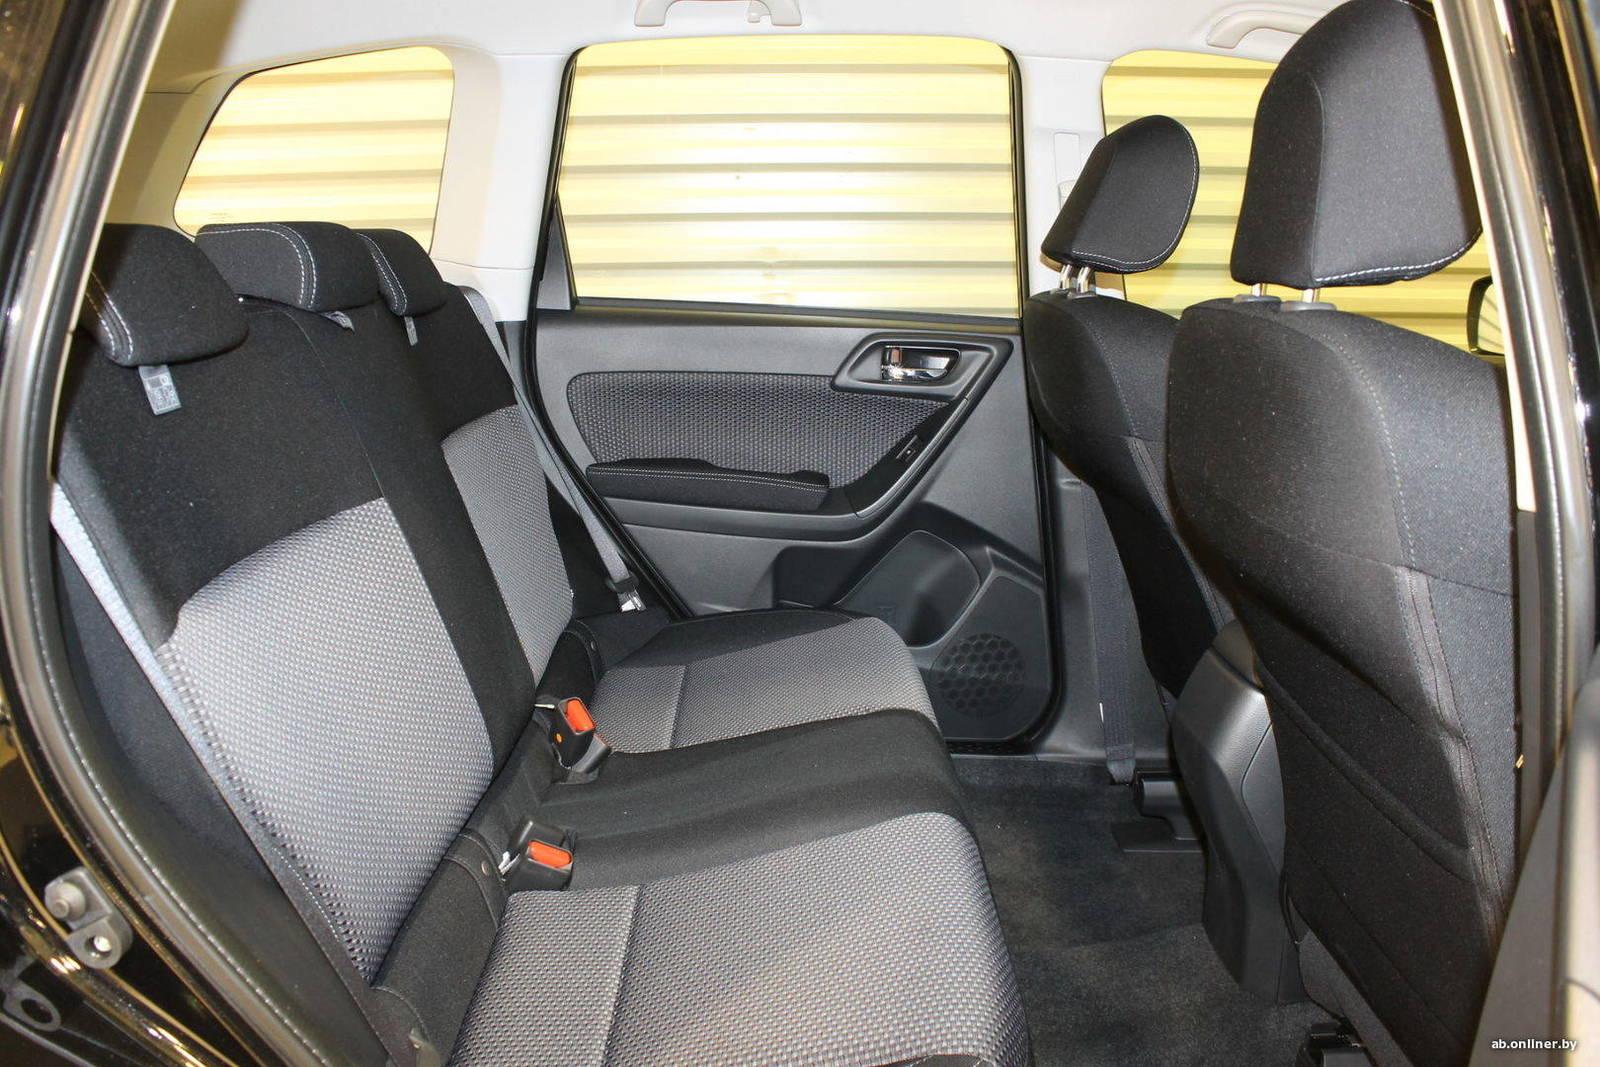 Subaru Forester STANDARD (VF) 2.0i CVT